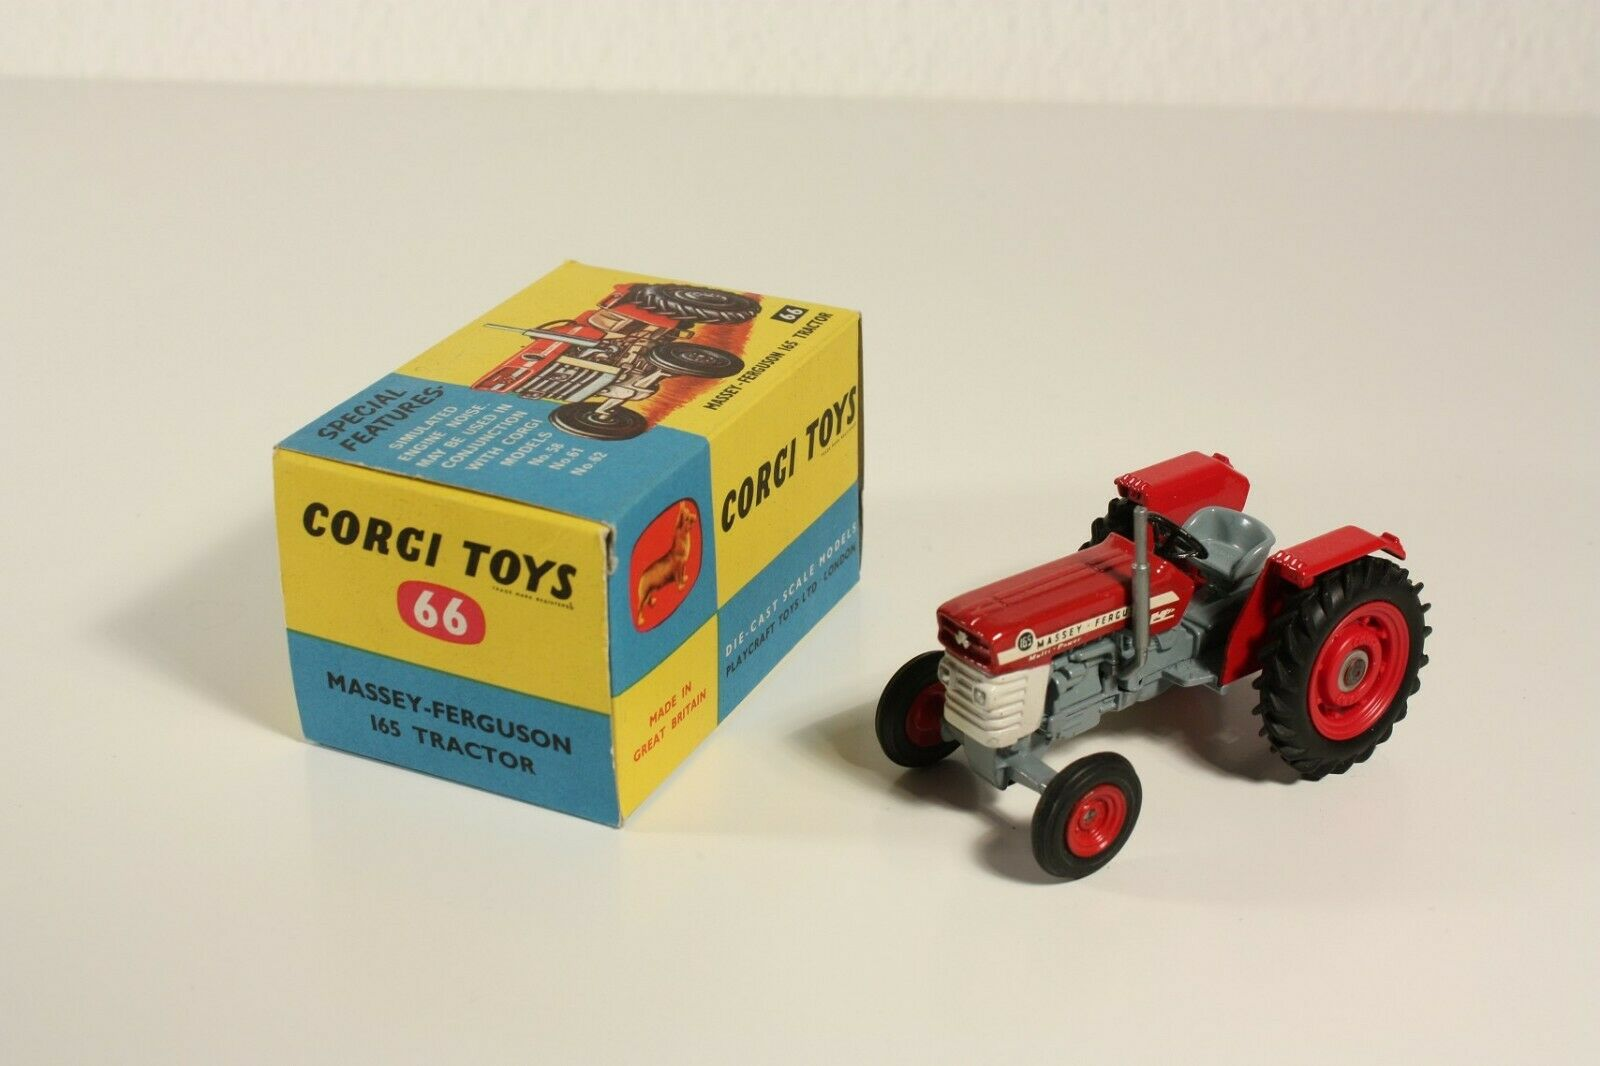 Corgi Toys 66 Massey-Ferguson 165 TRACTOR, MINT IN BOX  ab2300